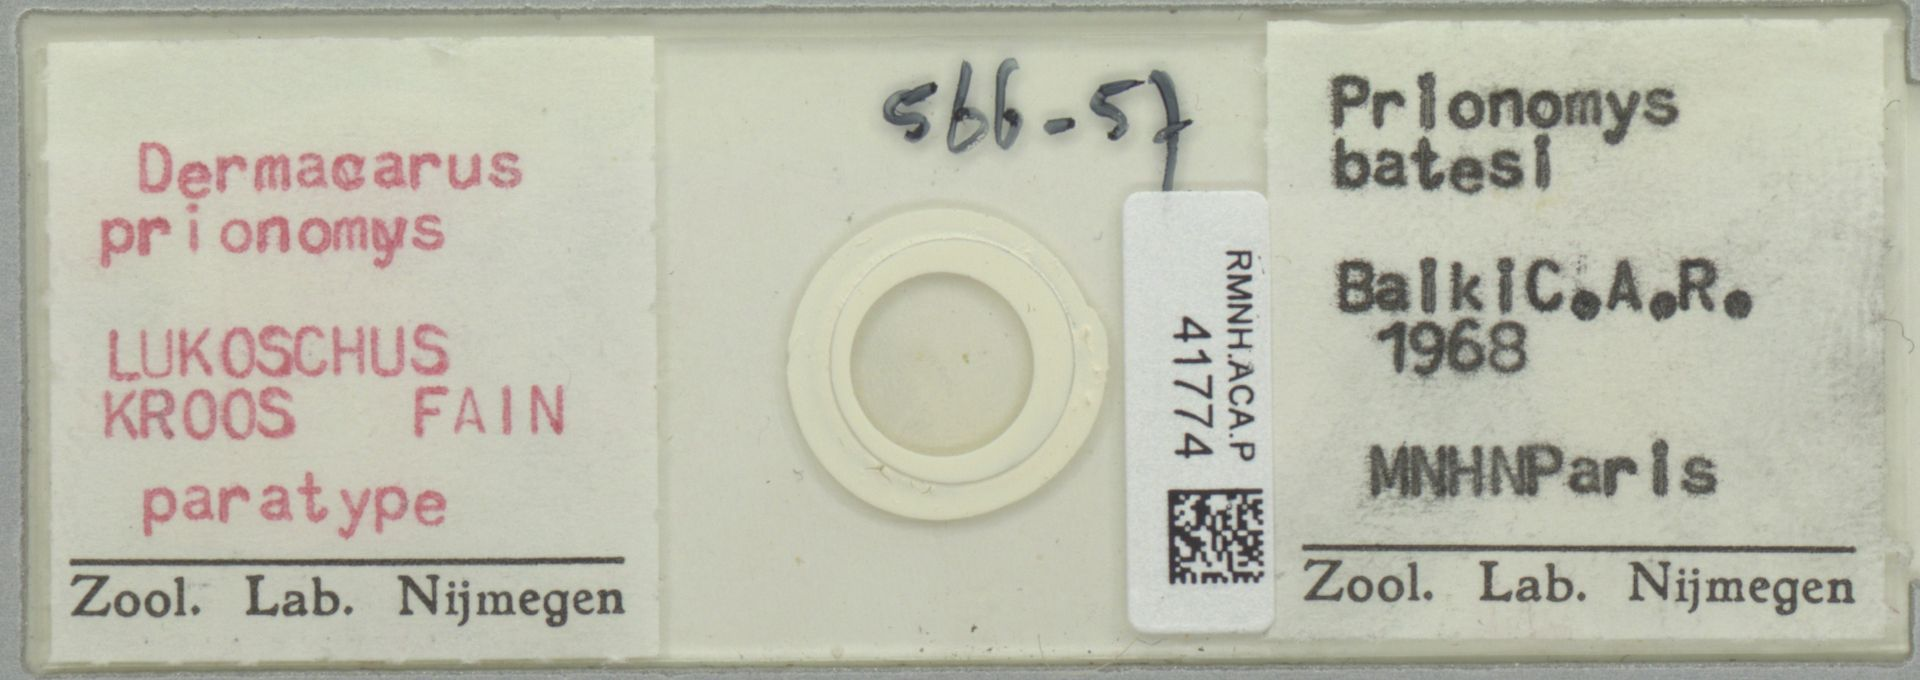 RMNH.ACA.P.41774 | Dermacarus prionomys Lukoschus, Kroos, Fain